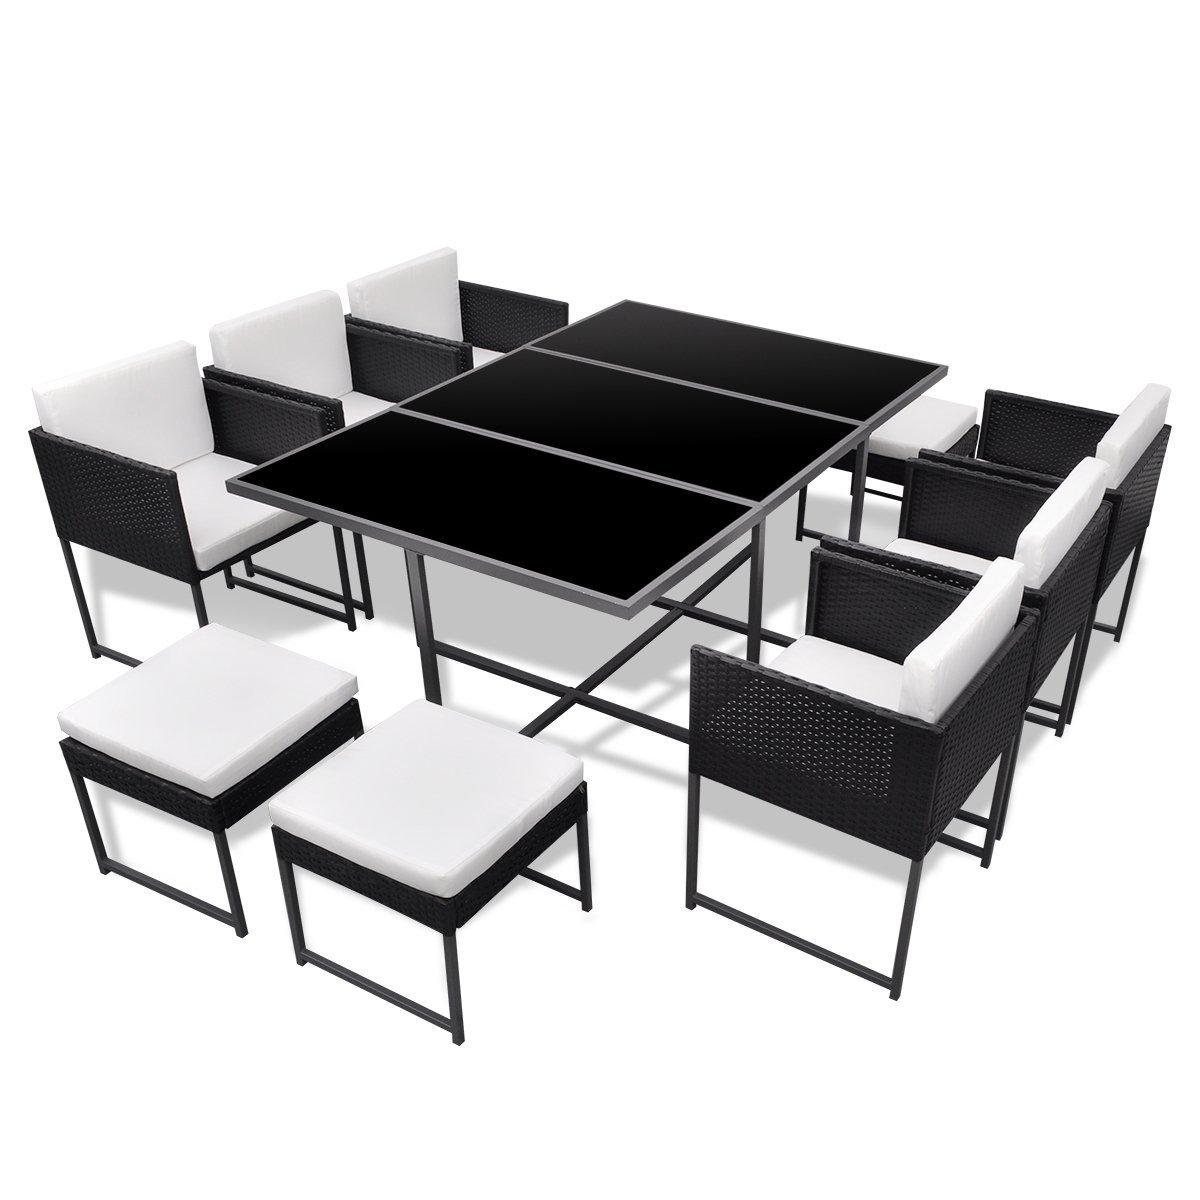 vidaXL 27-tlg. Gartenmöbel-Set Essgruppe schwarz Poly Rattan günstig